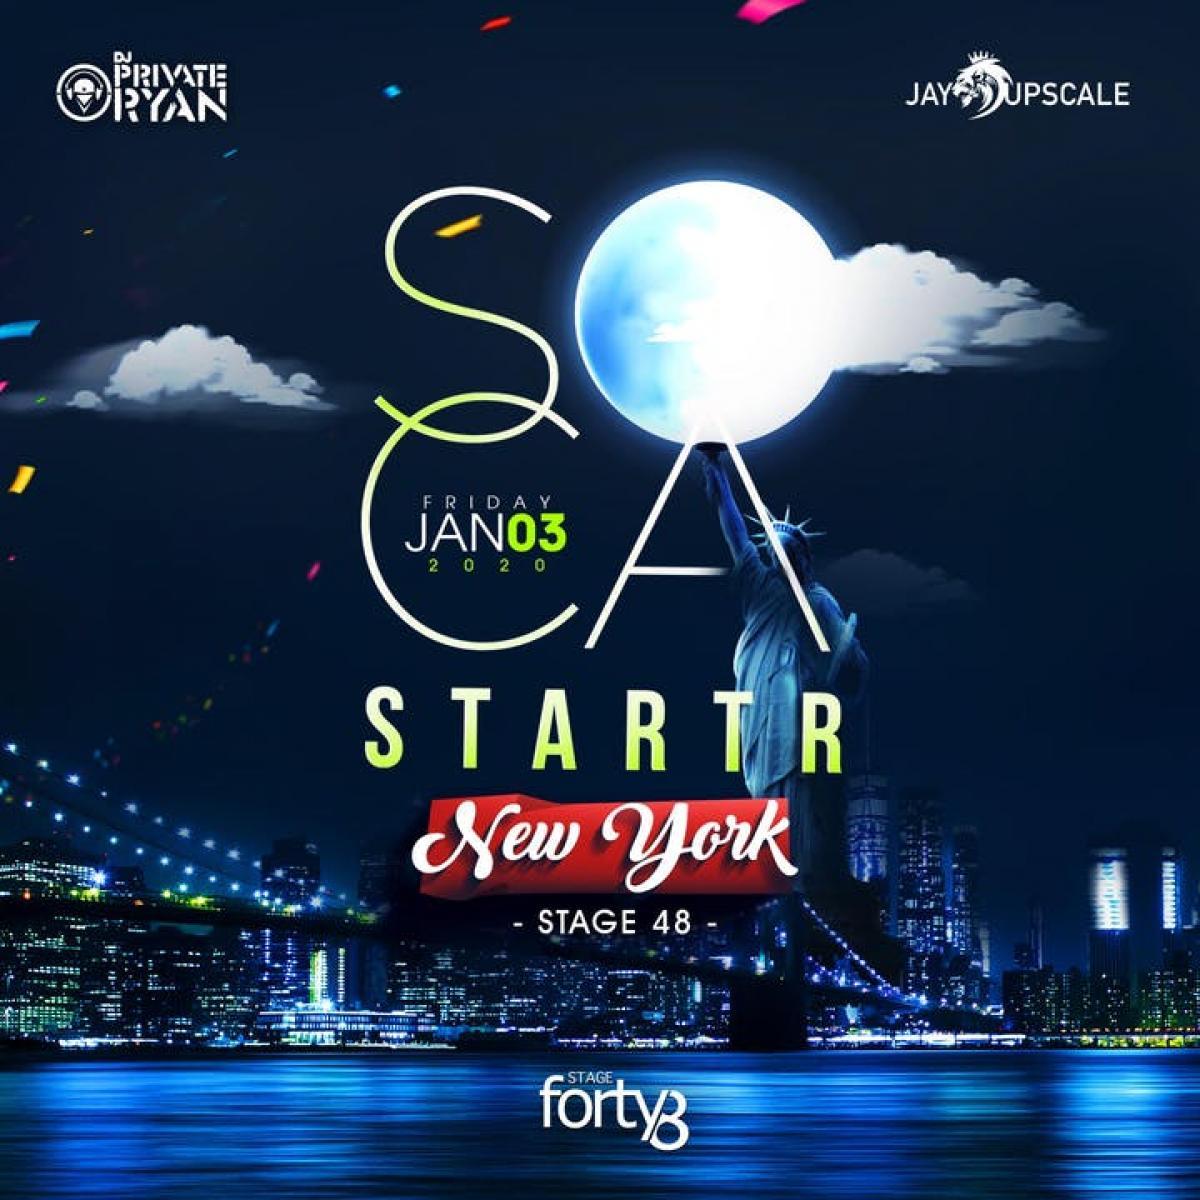 Soca Starter flyer or graphic.